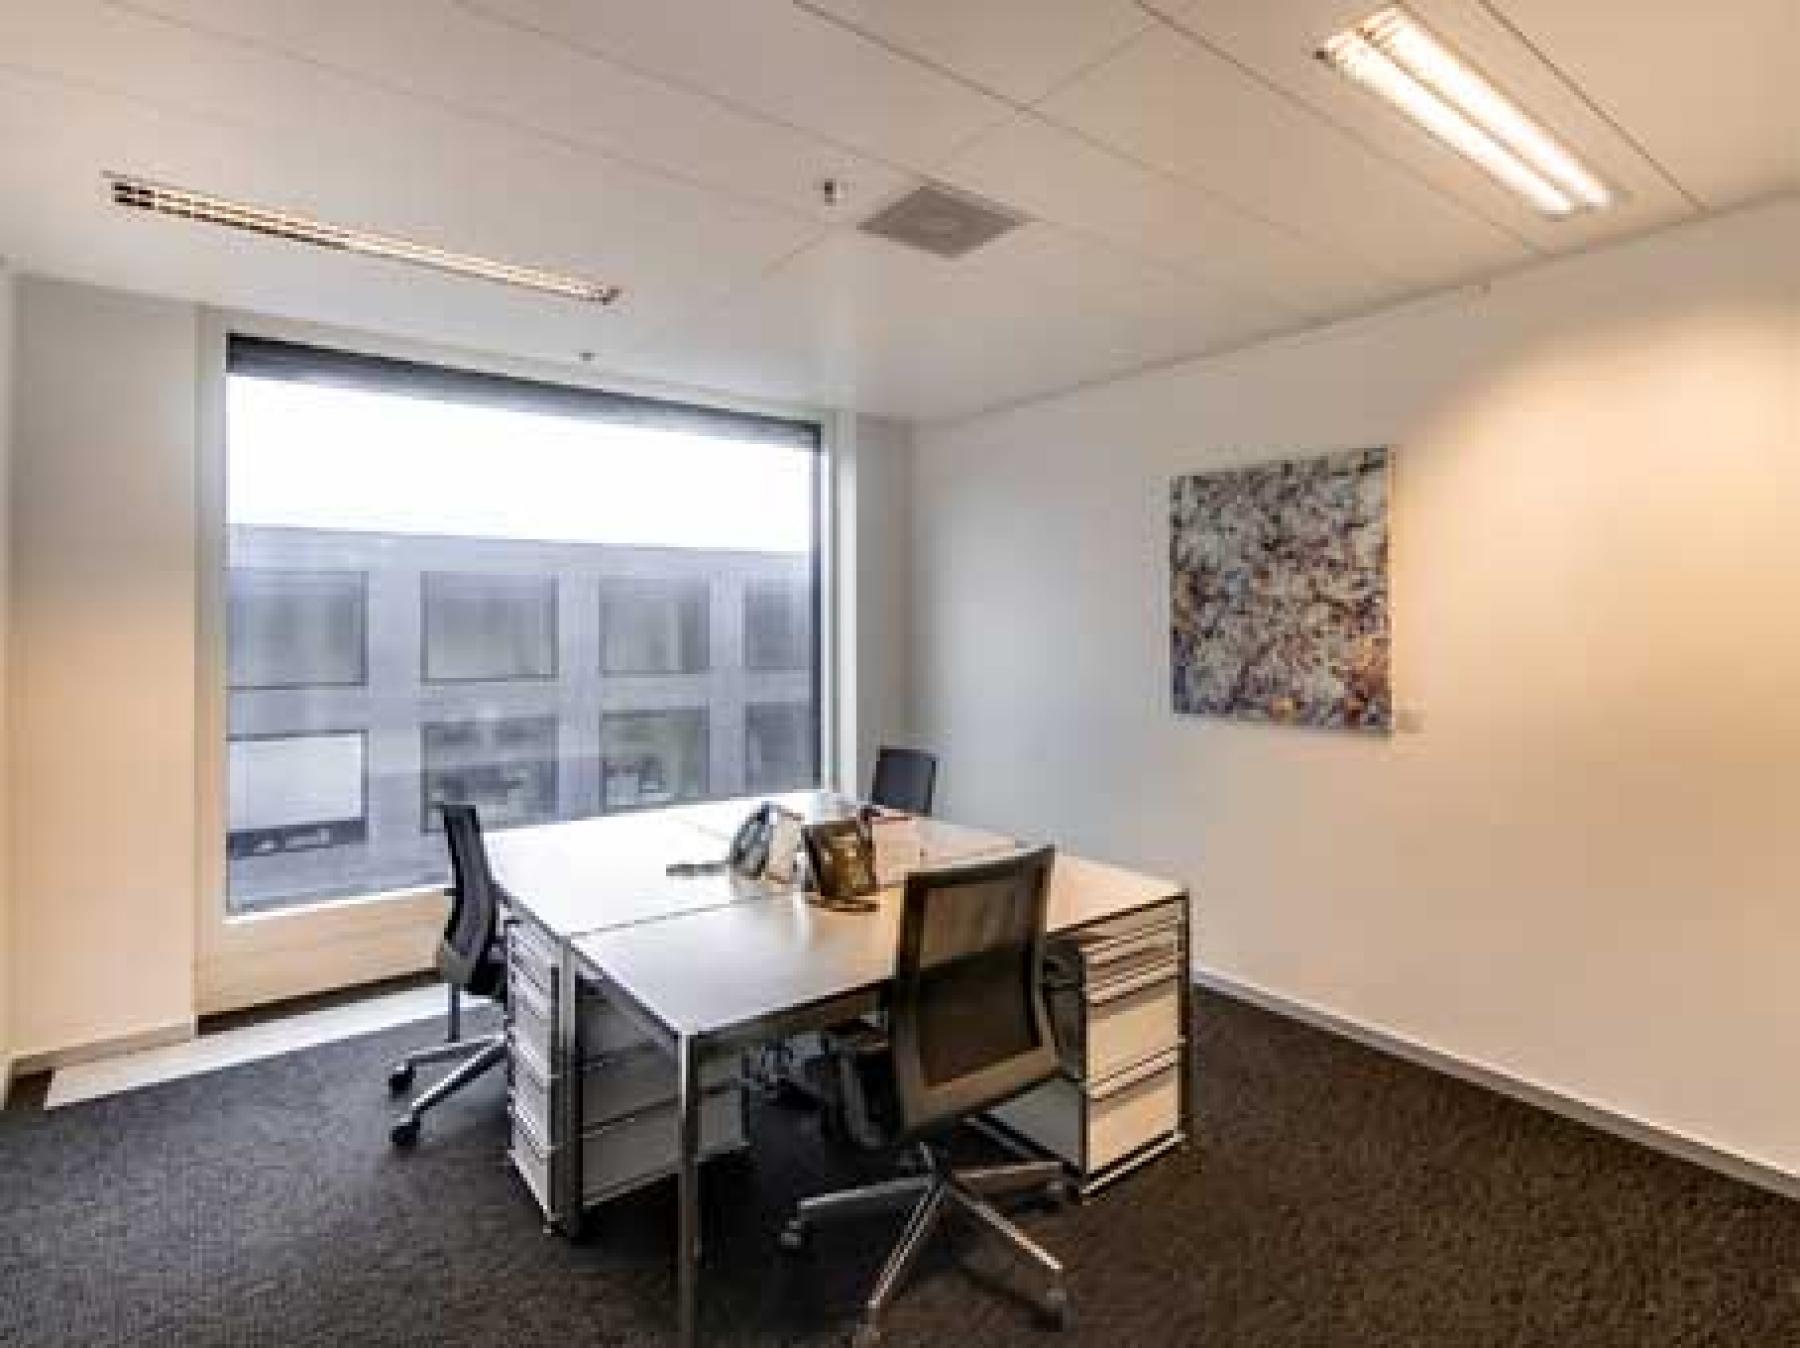 Helles Büro mieten im Business Center in Zürich-Flughafen